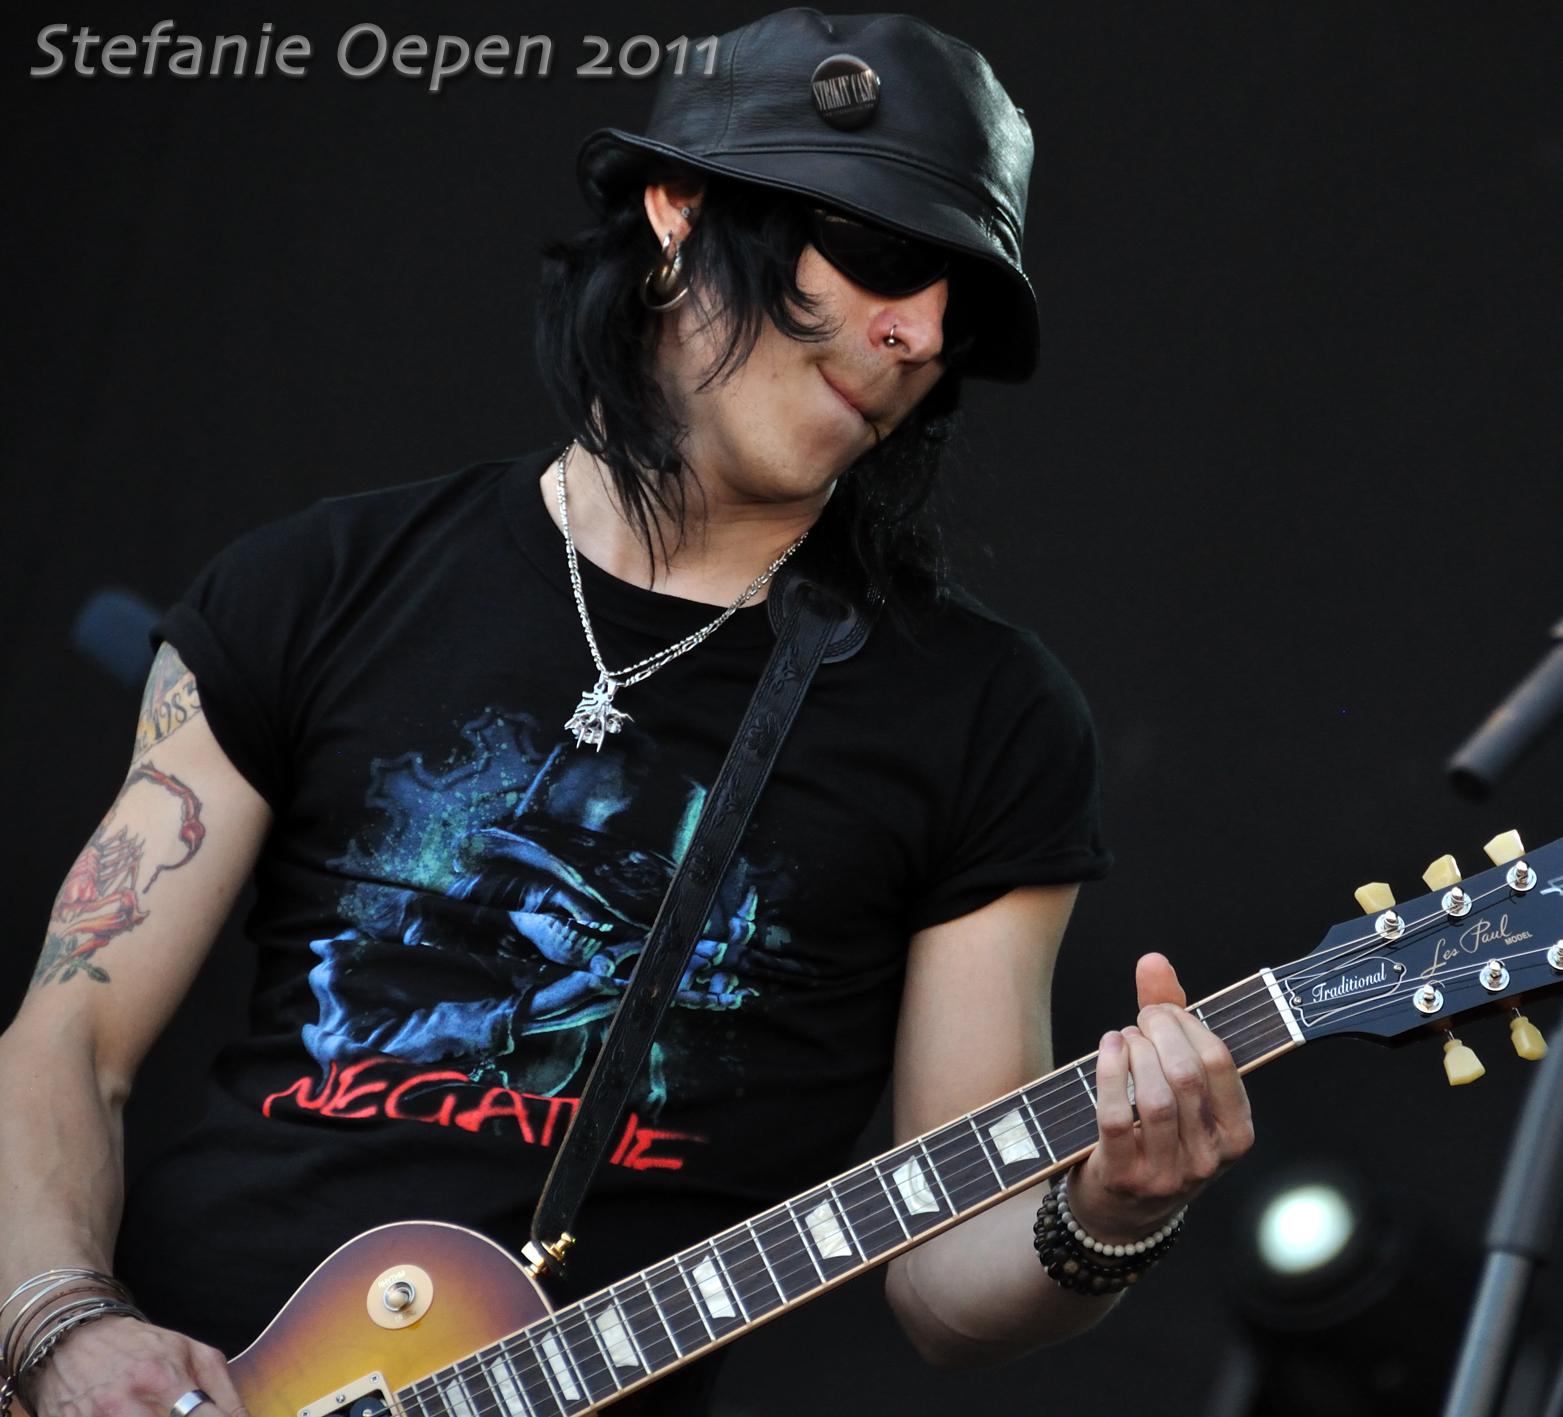 Larry Love (Negative); Radio Aalto festival 2011